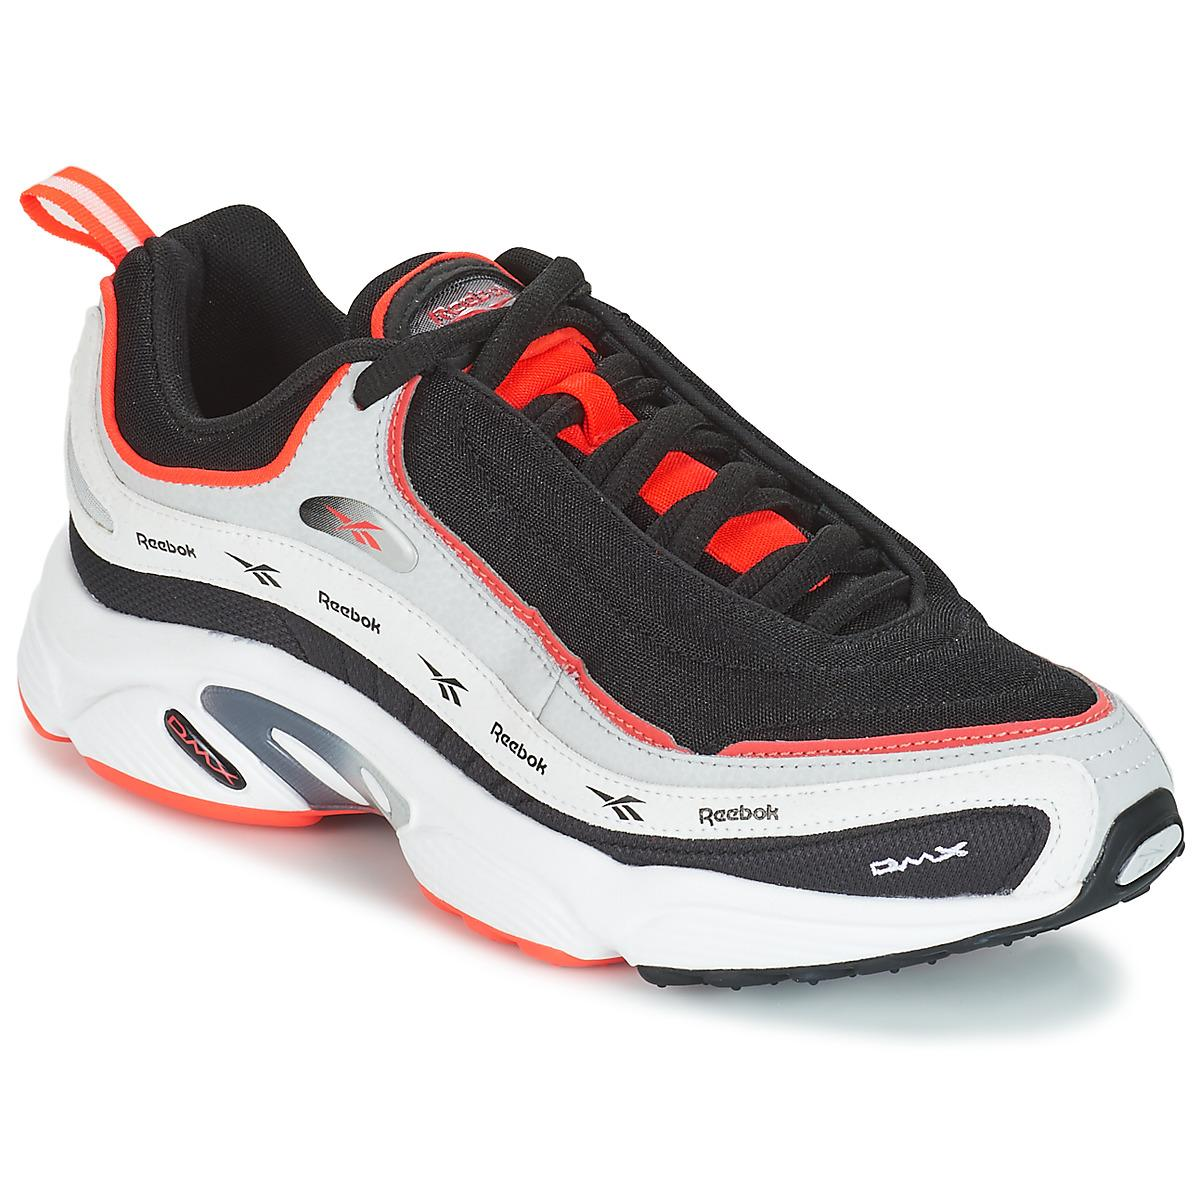 ada29f76430b3e Reebok - Gray Daytona Dmx Vector Shoes (trainers) for Men - Lyst. View  fullscreen